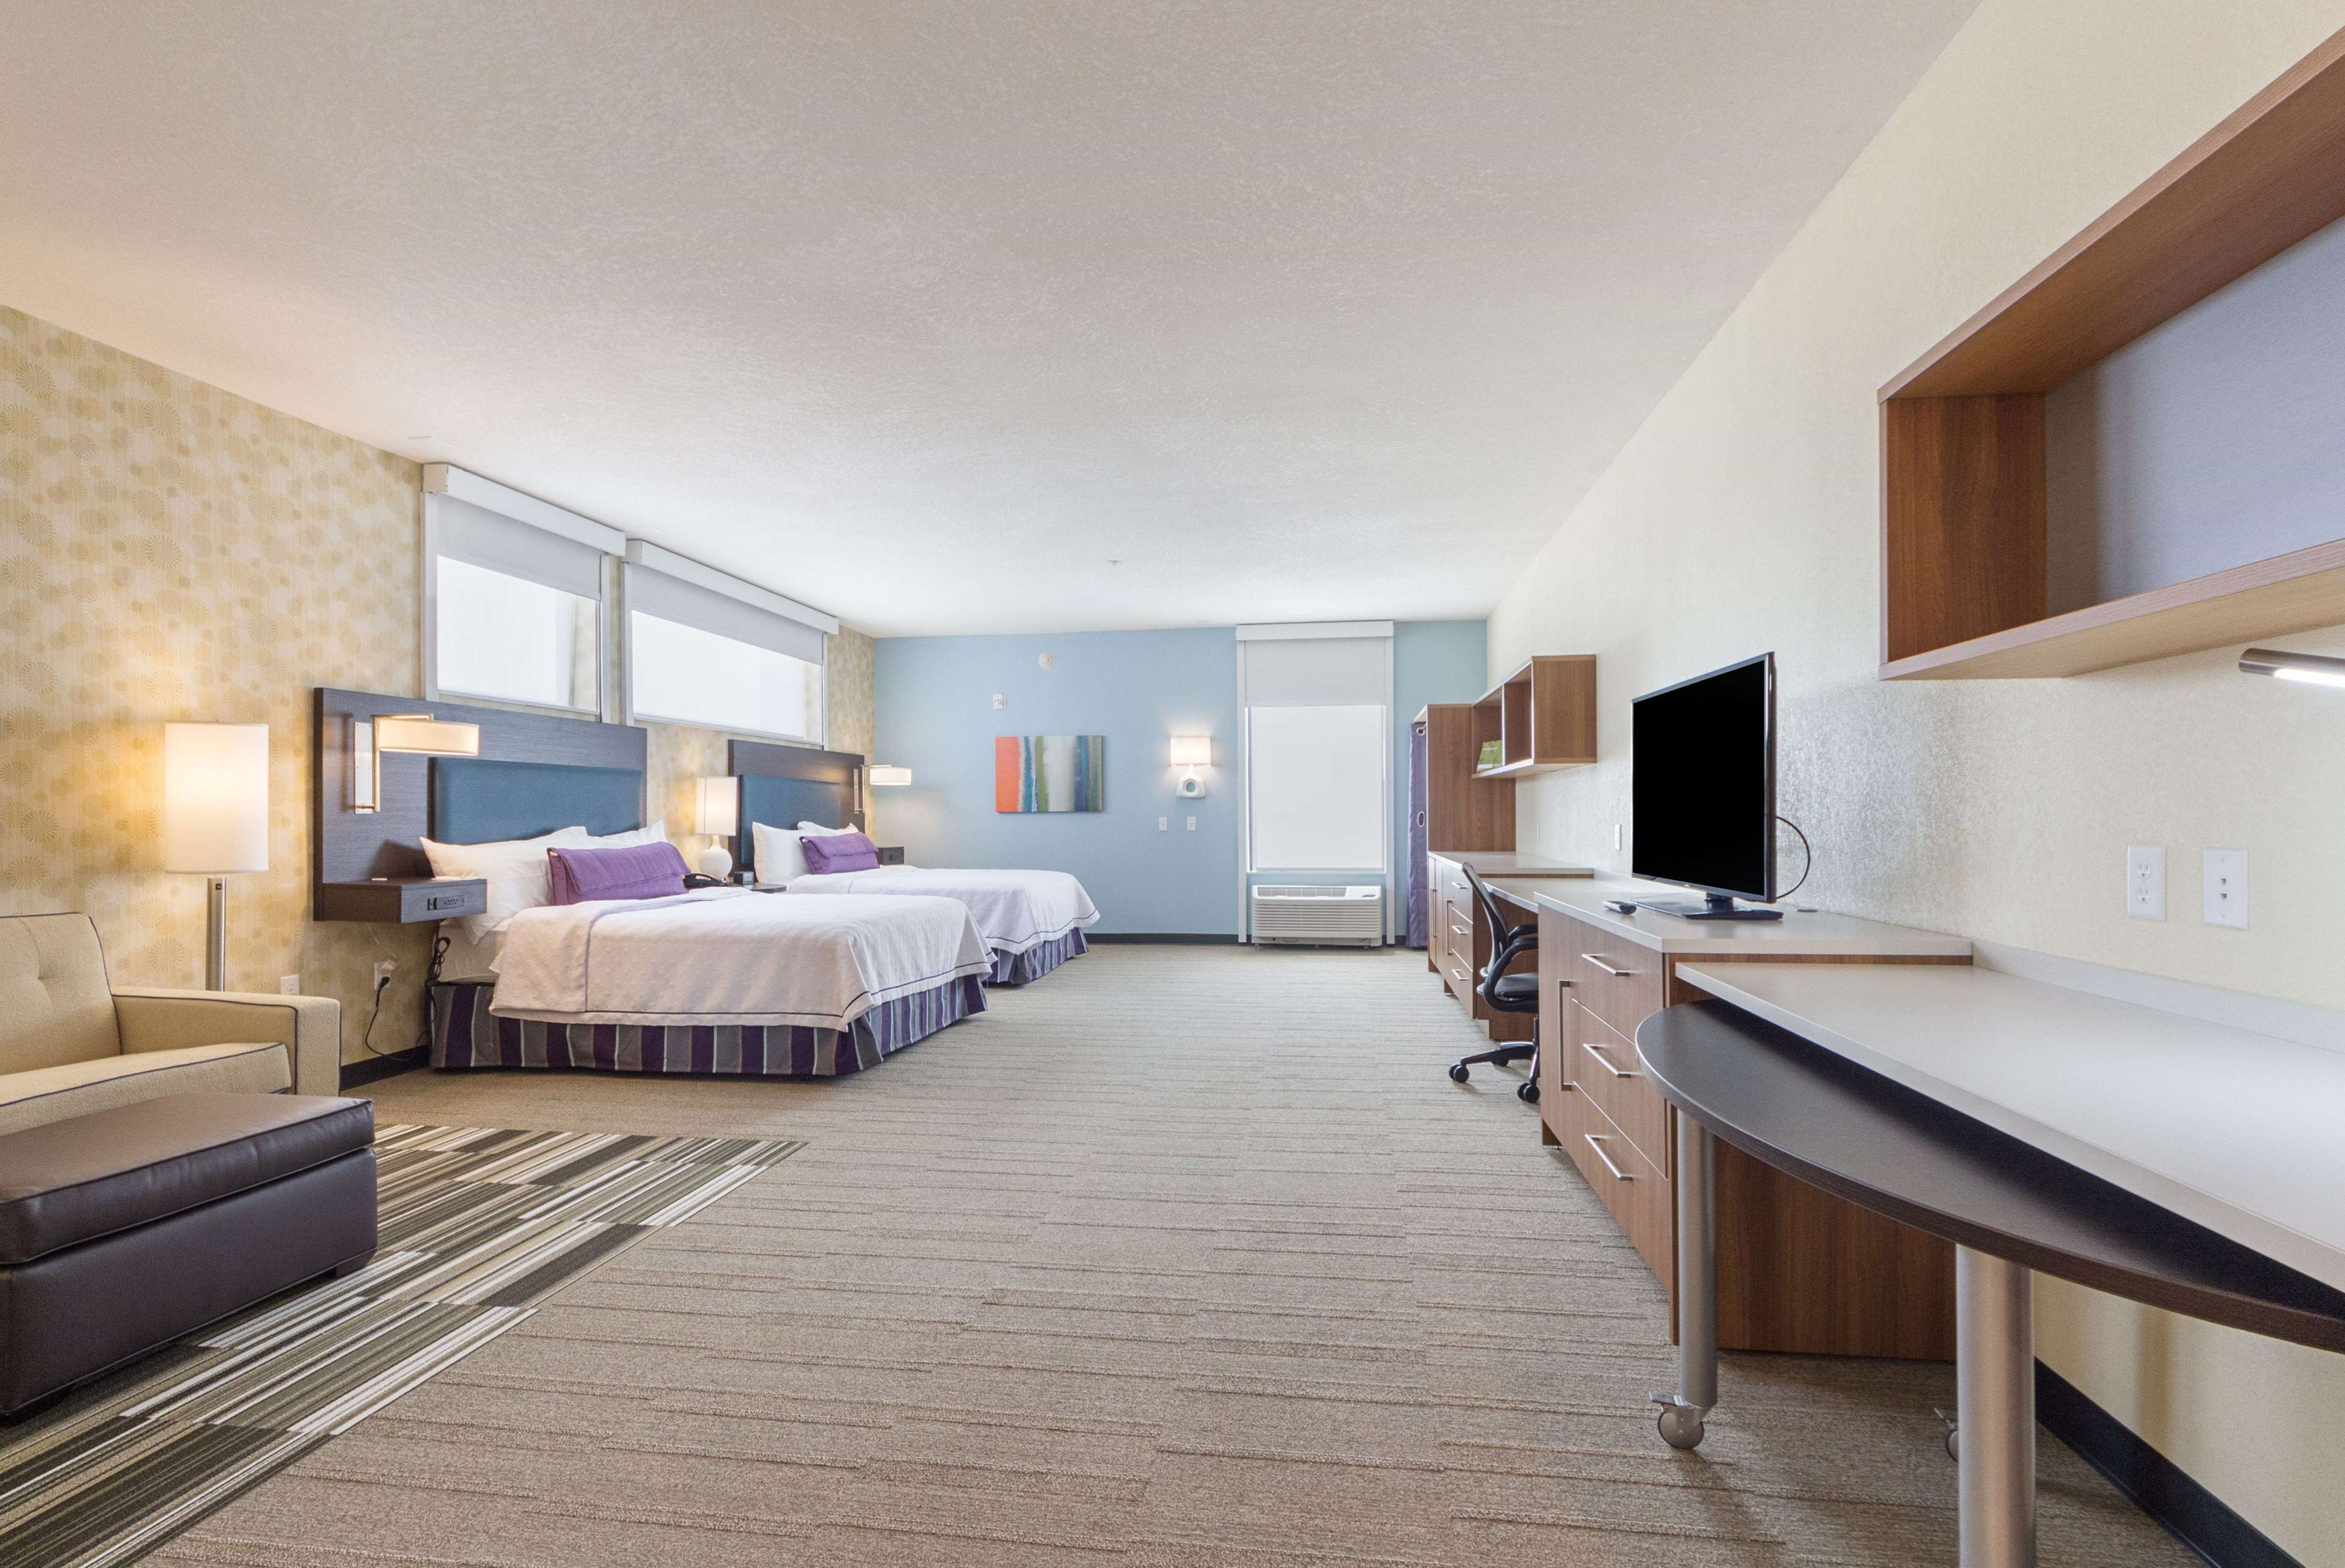 Home 2 Suites by Hilton - Yukon image 39